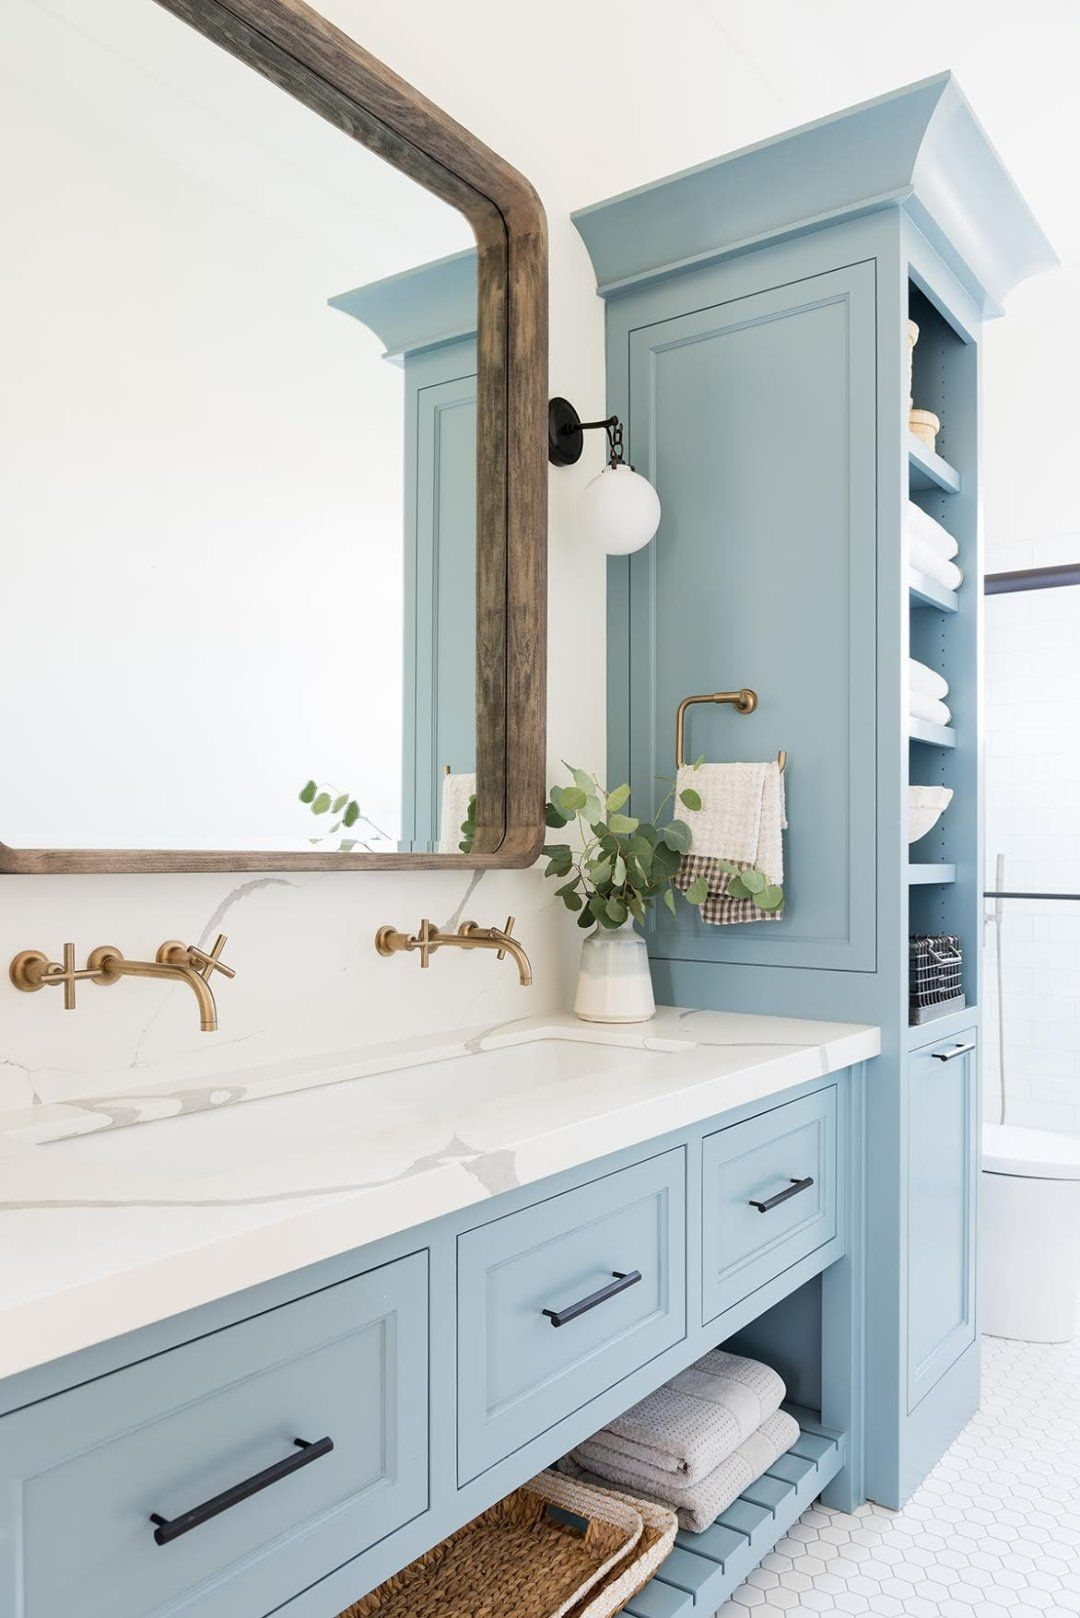 Marvelous Master Bathroom Ideas For Home47